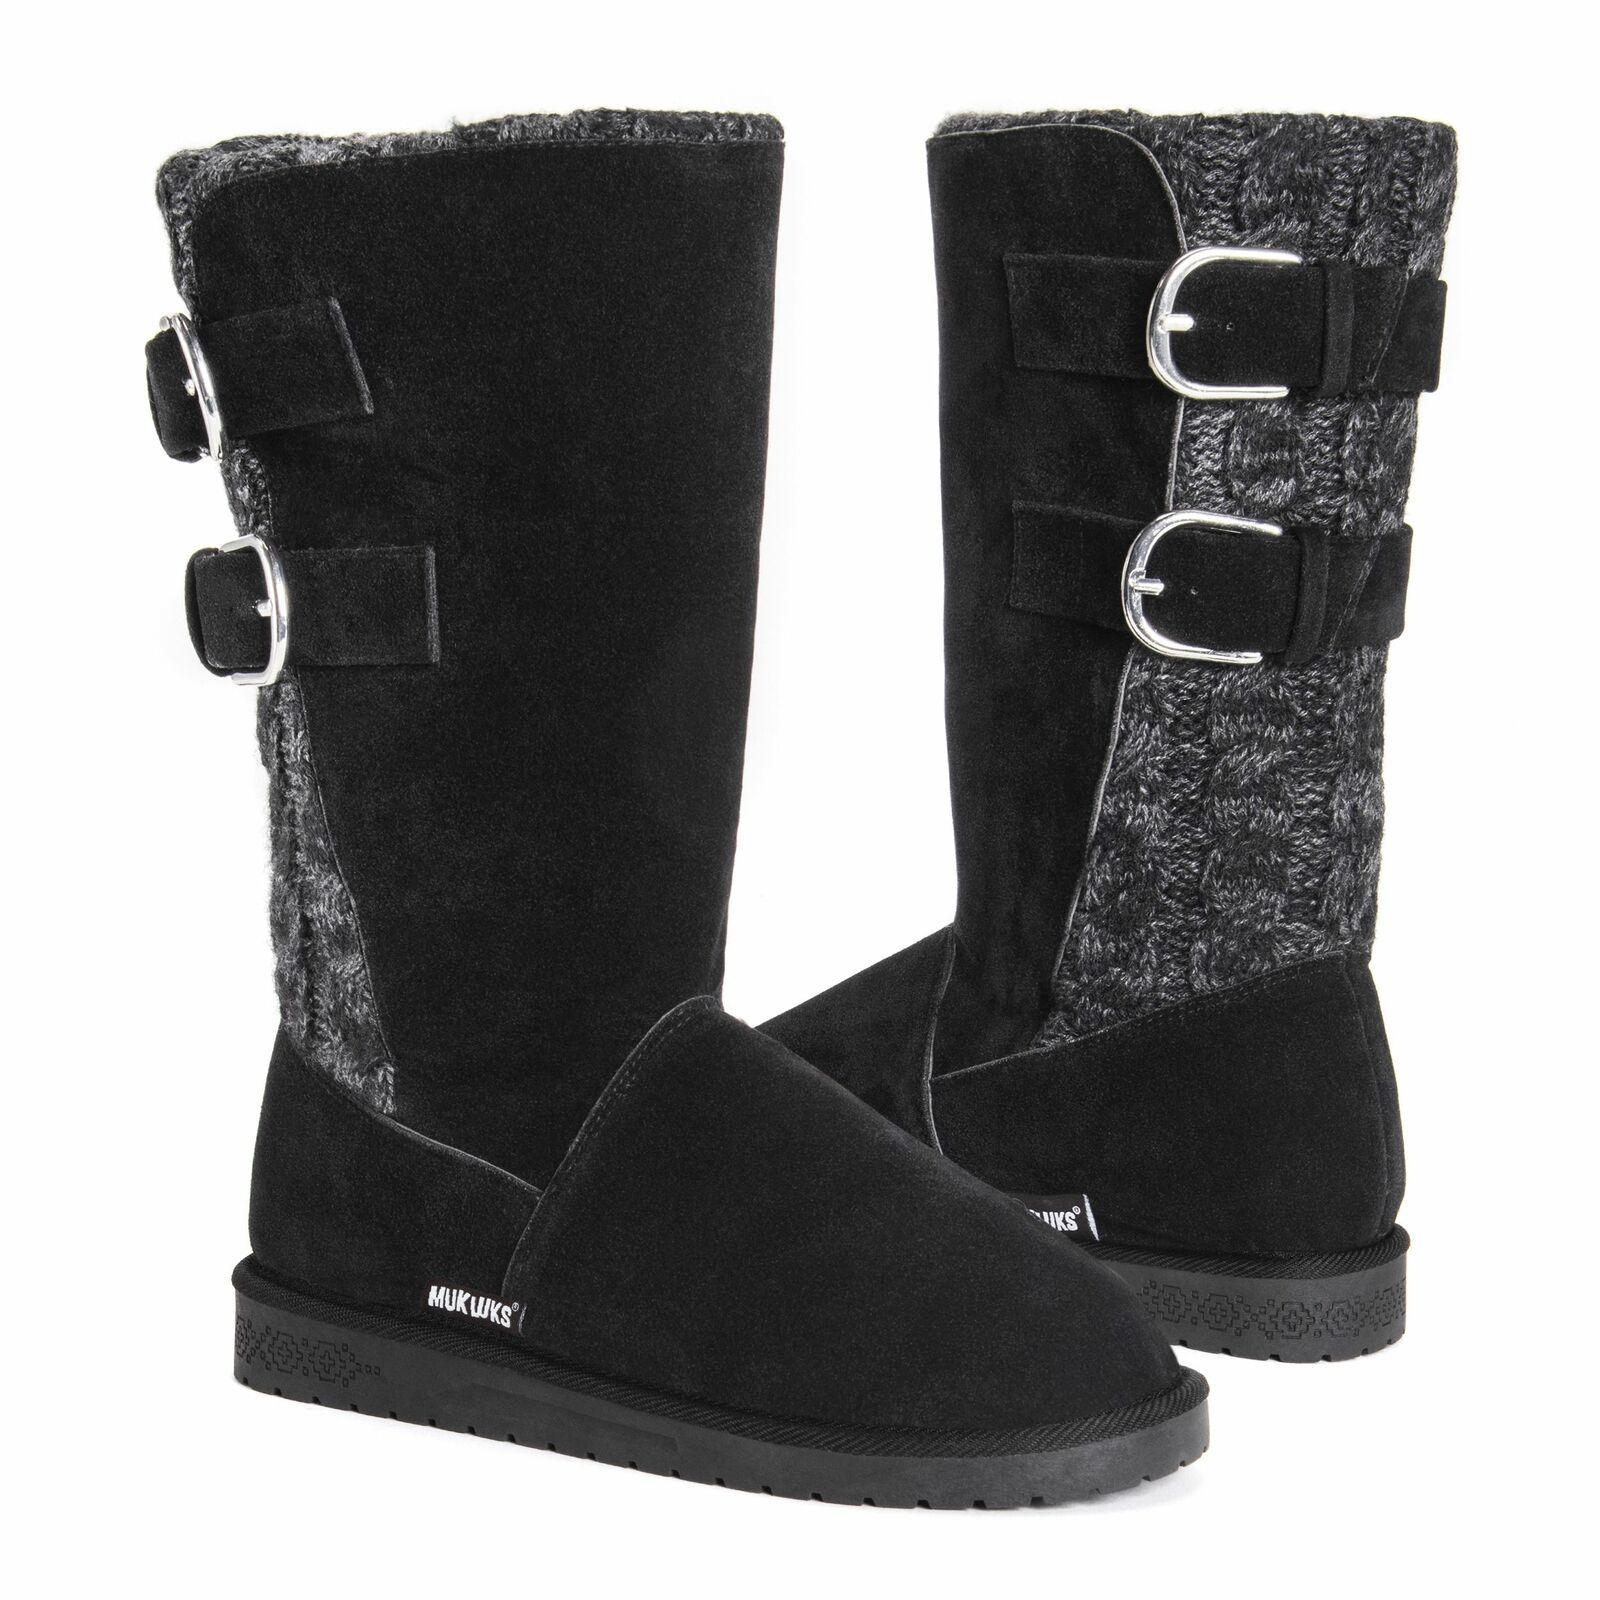 Muk Luks Women's Jean Boot Size 6 Black/Grey - $44.99